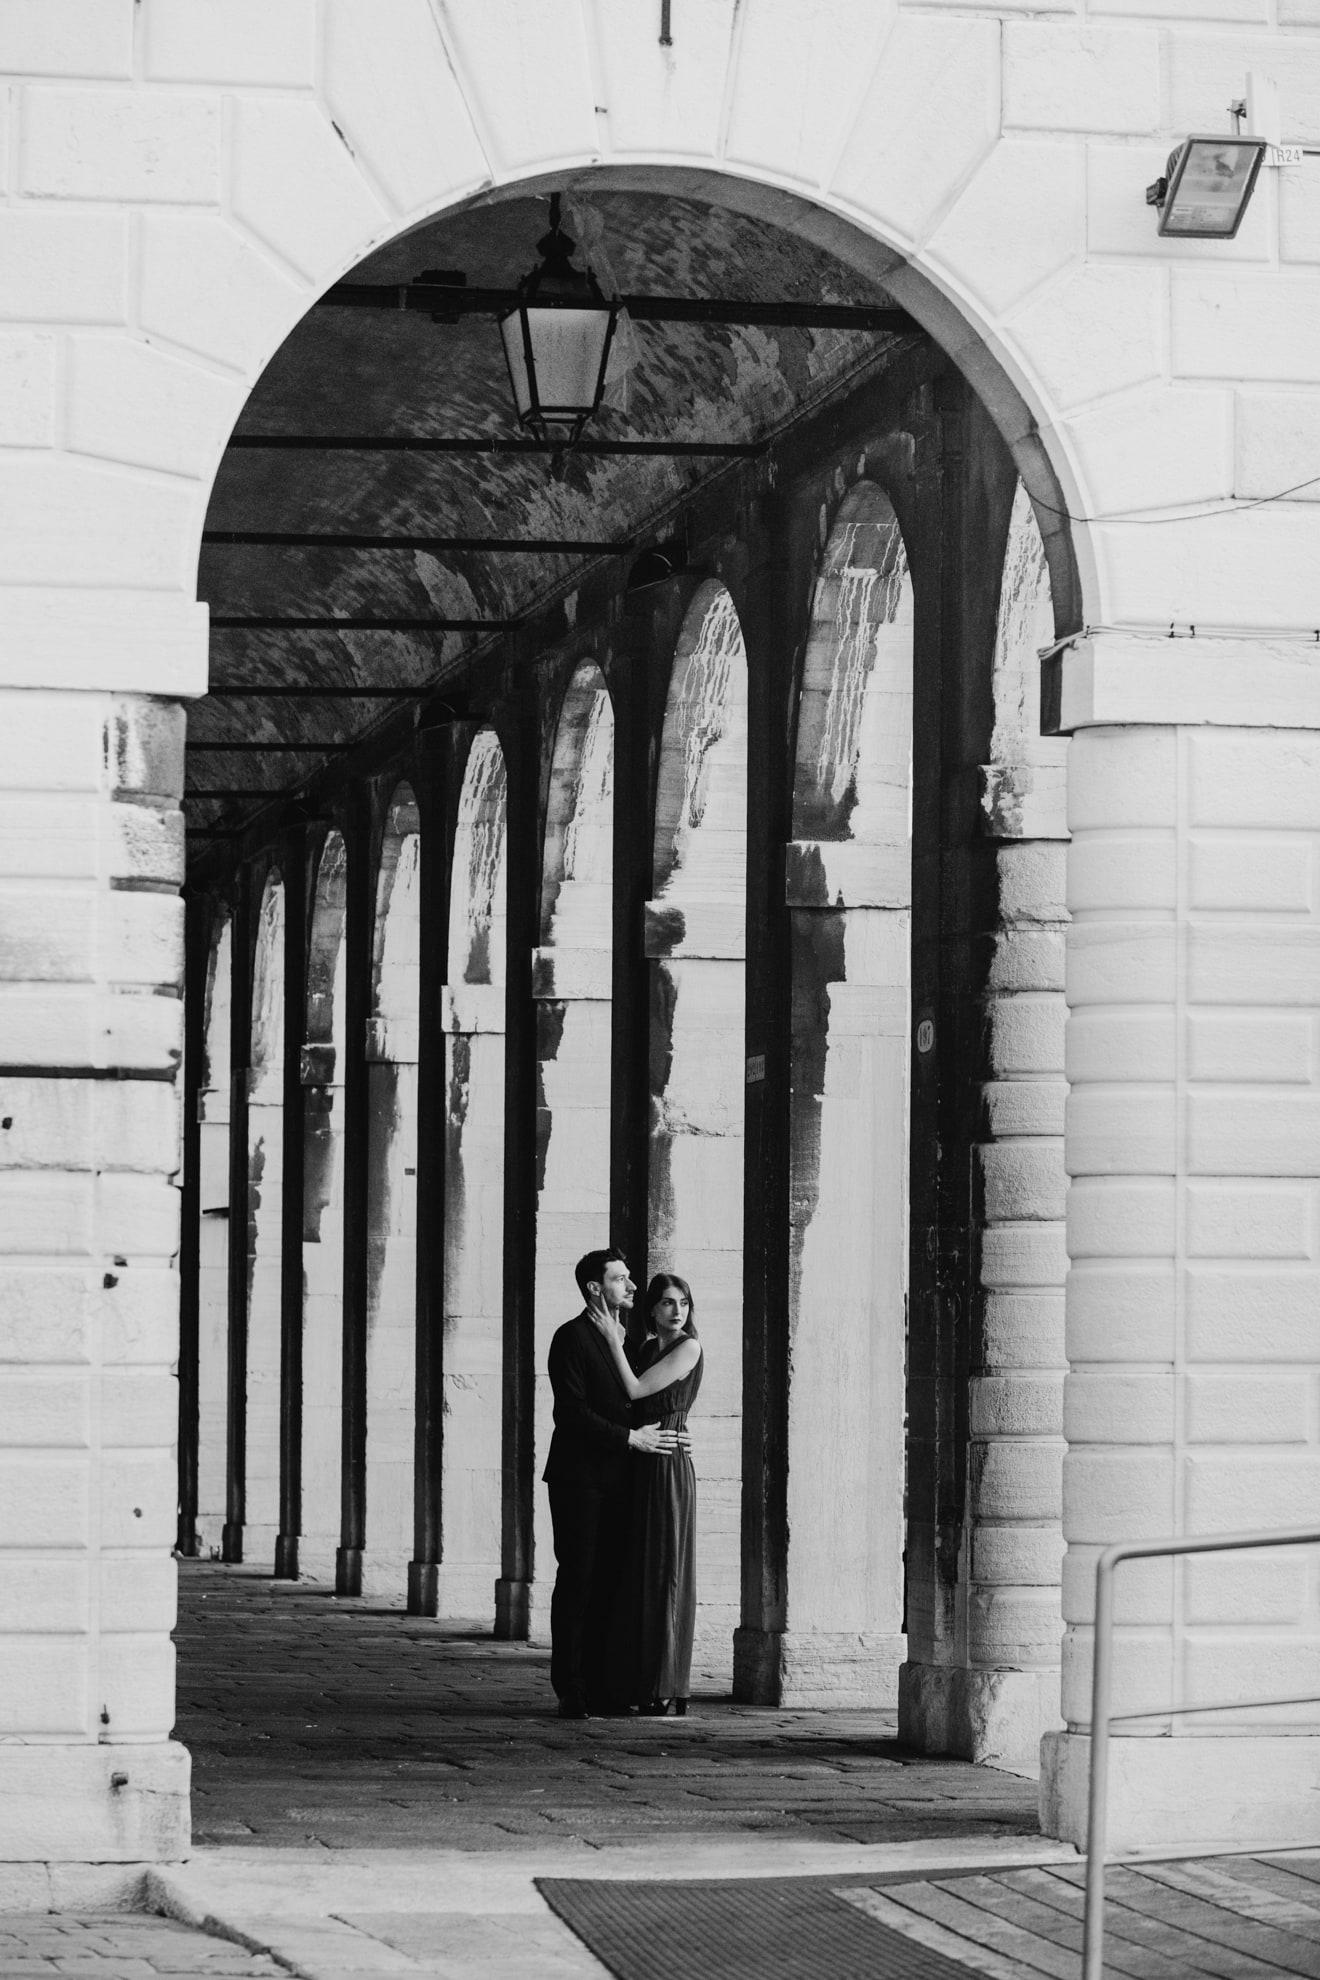 engagement venice venezia proposal proposta matrimonio fidanzamento irene pollacchi fotografa 21